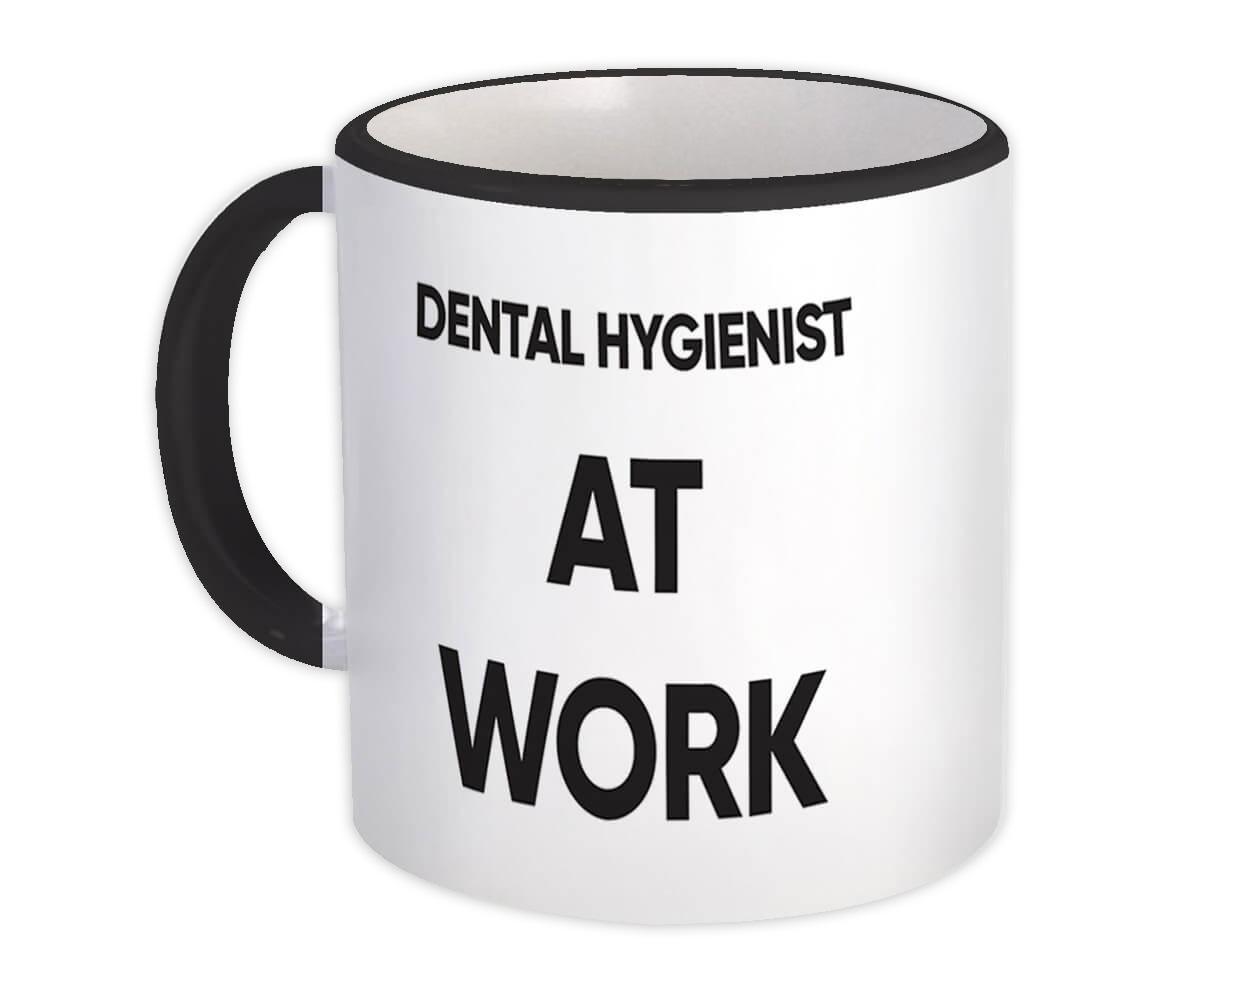 DENTAL HYGIENIST At Work : Gift Mug Job Profession Office Coworker Christmas